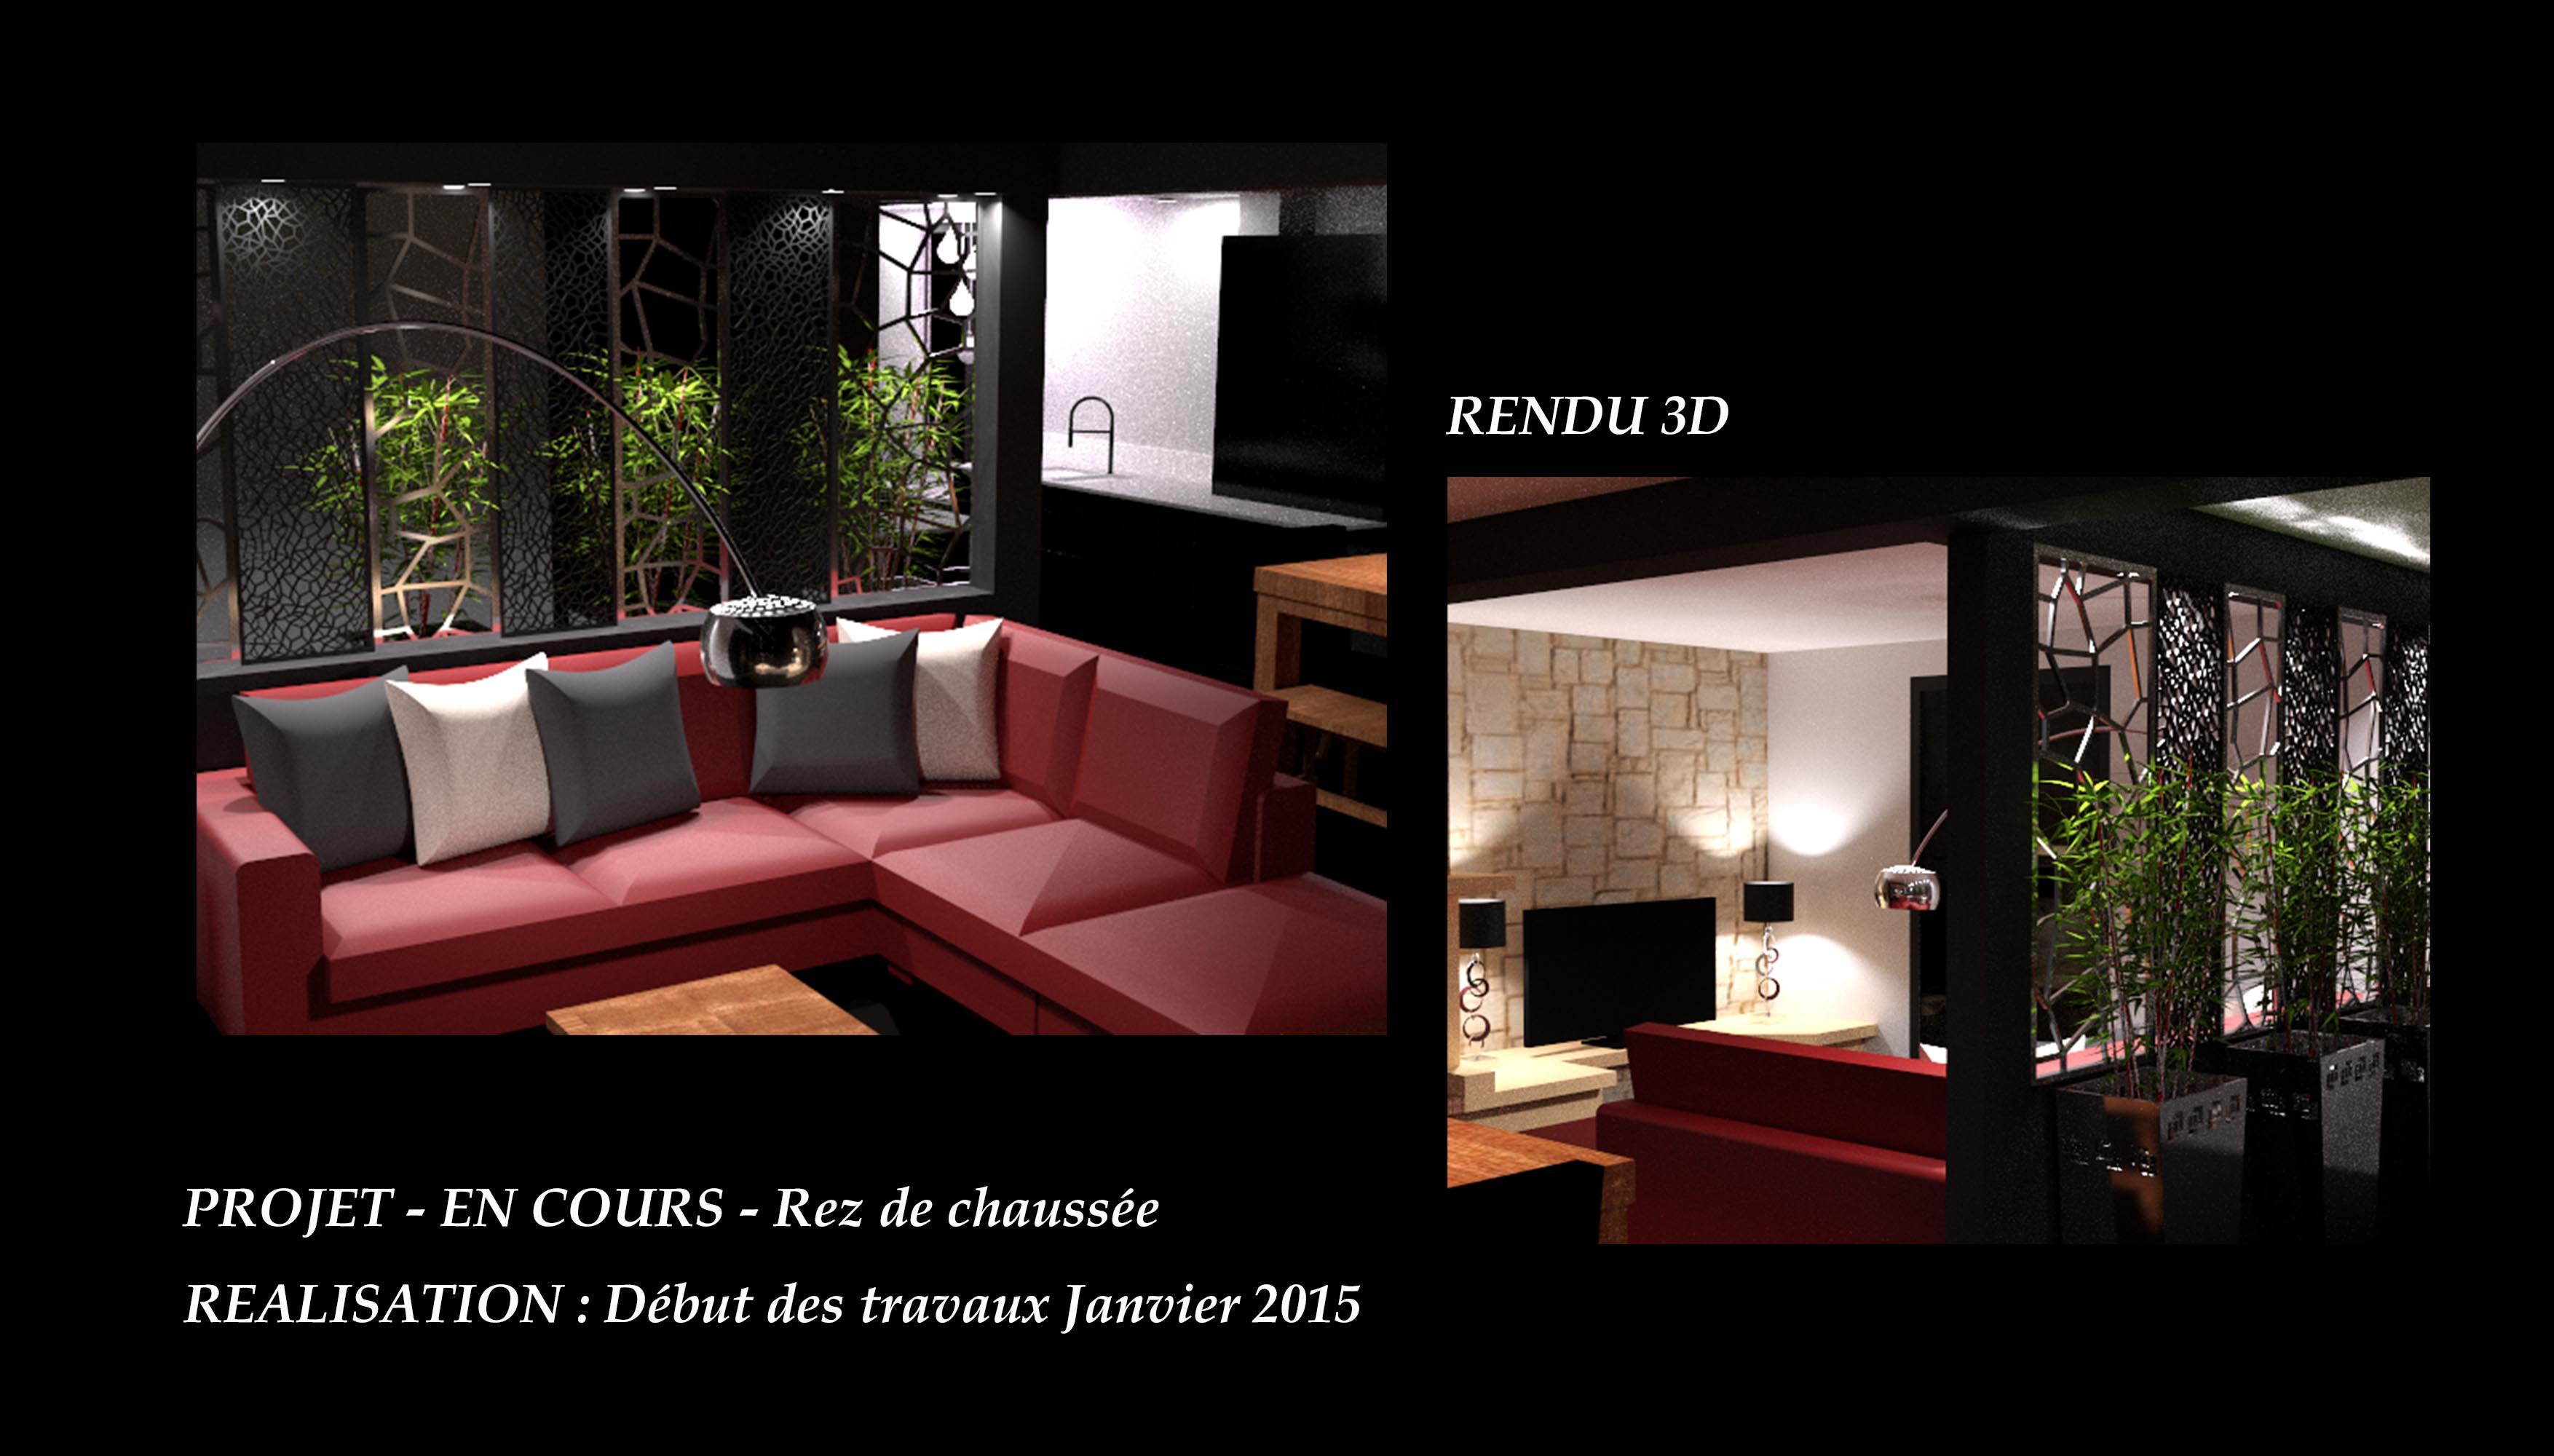 cadlink isabelle bourcier architecte d 39 int rieur. Black Bedroom Furniture Sets. Home Design Ideas